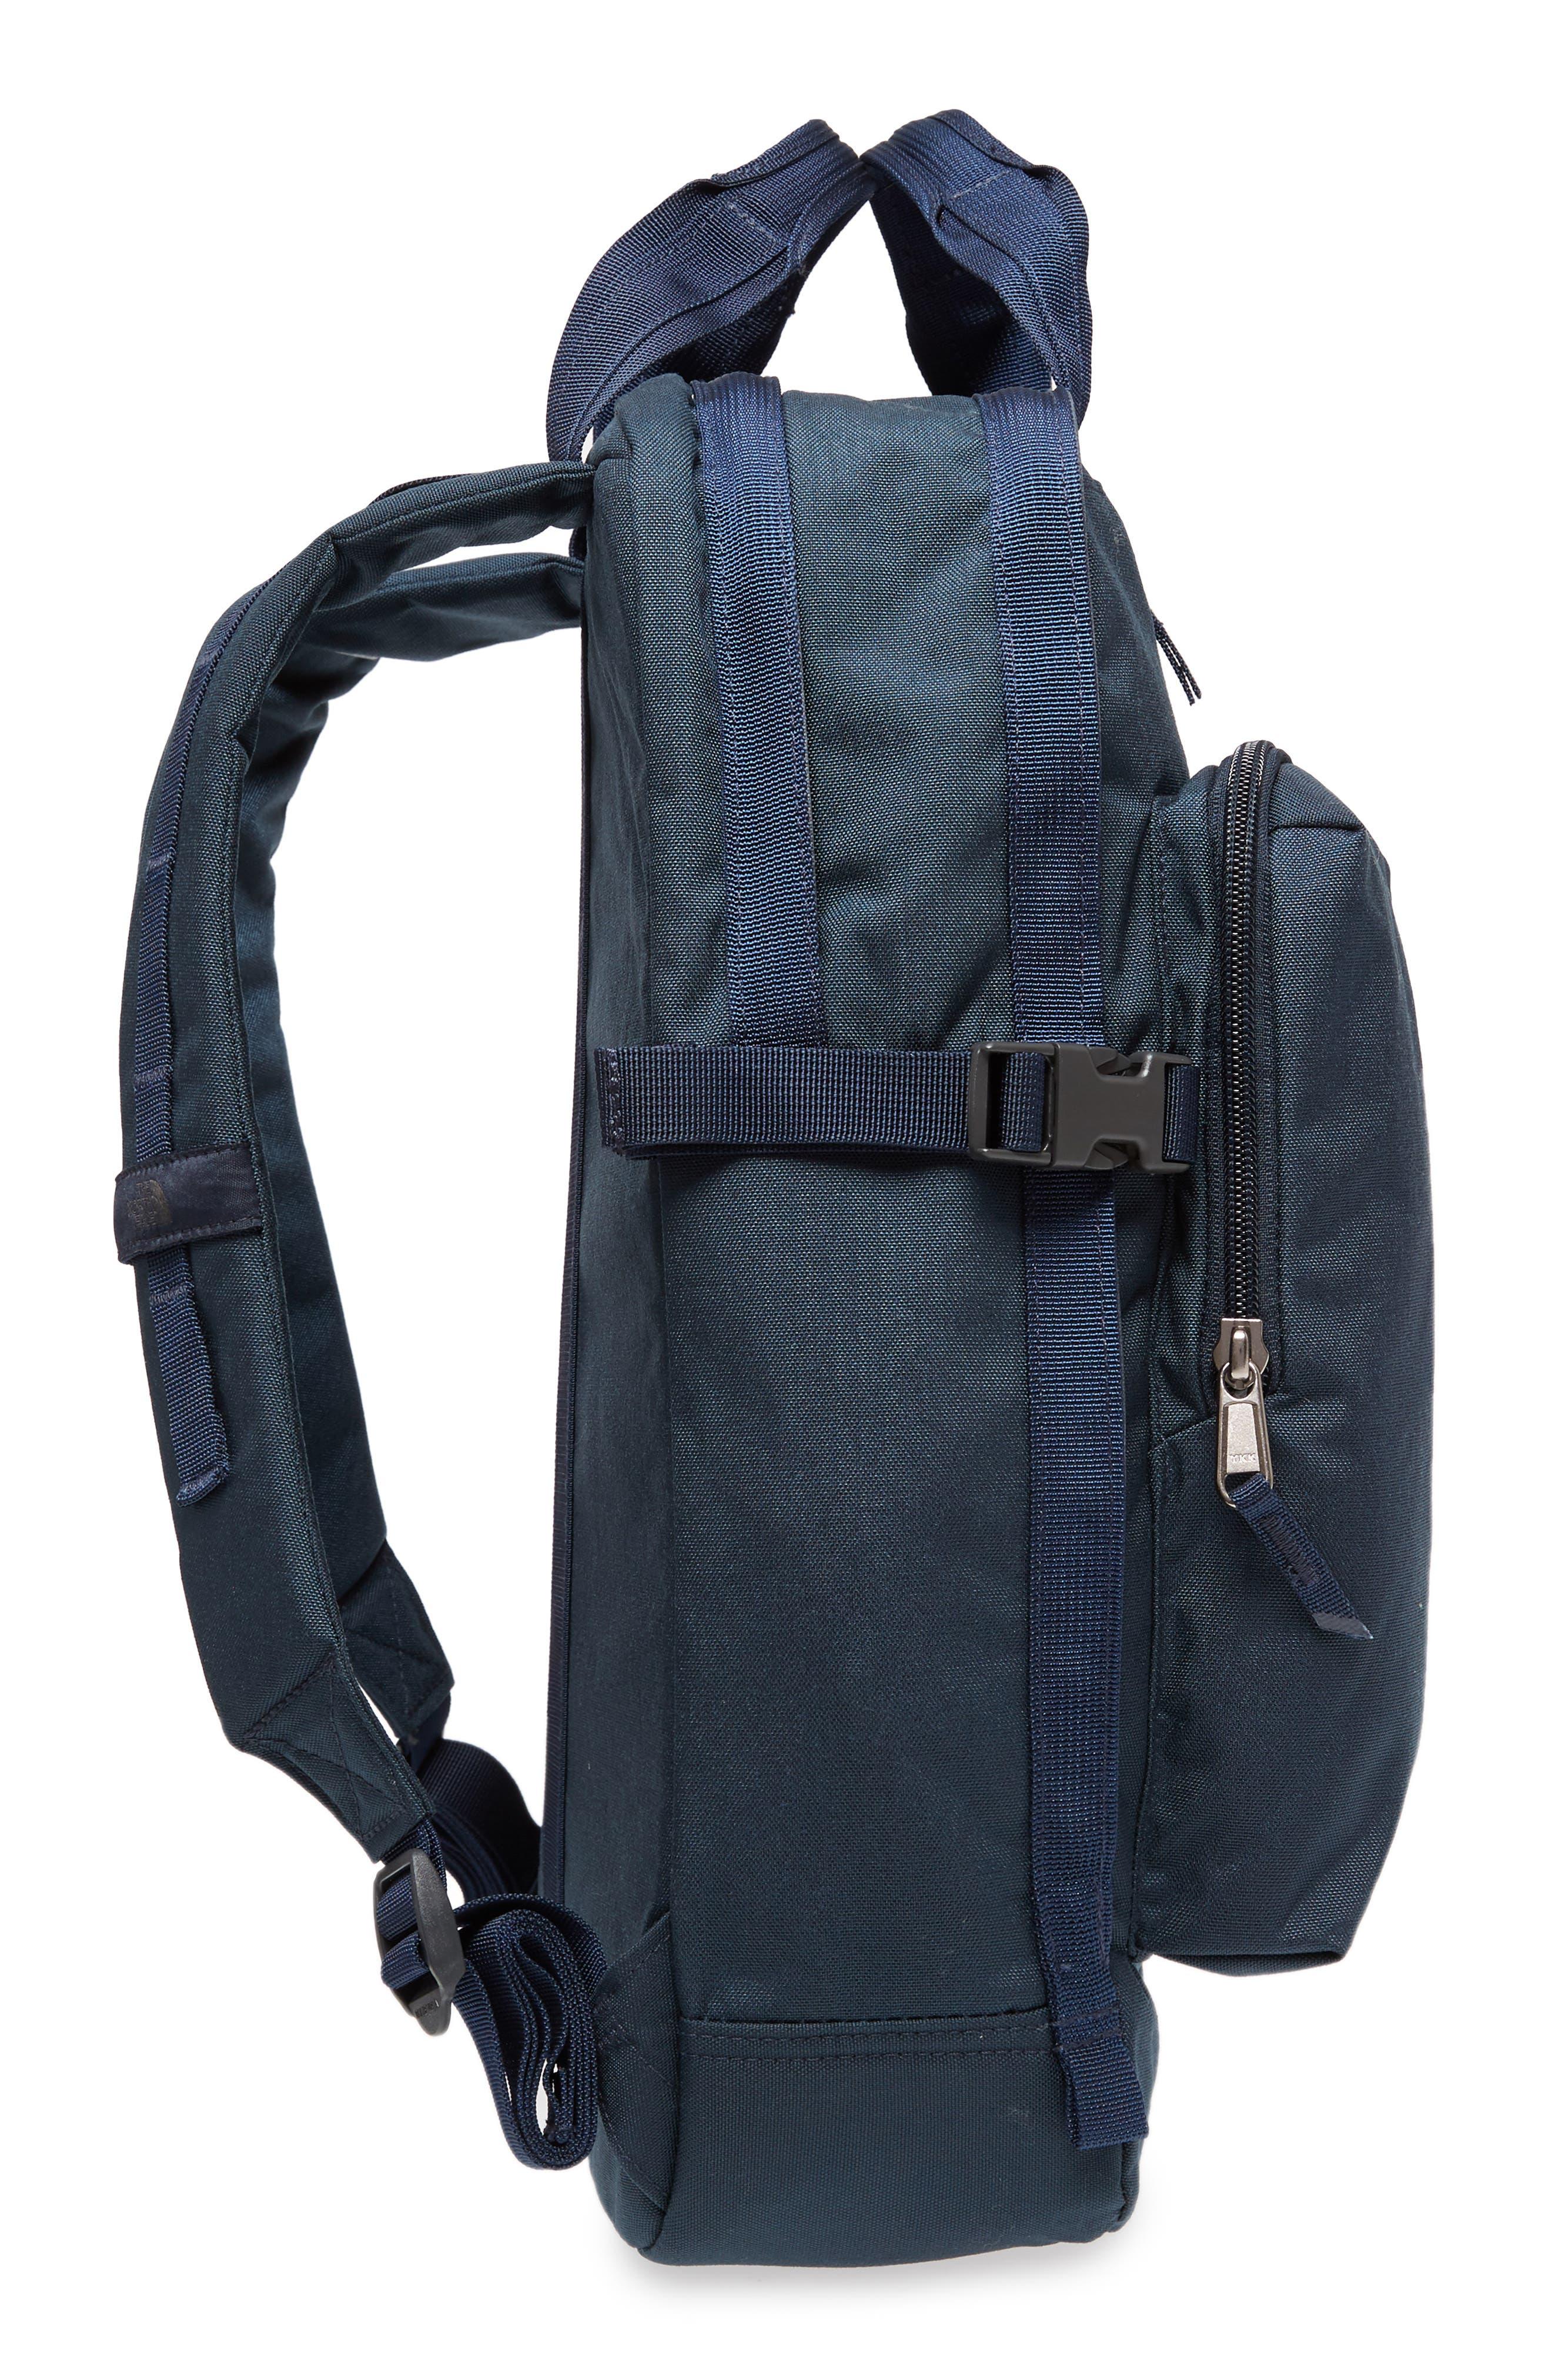 Mini Crevasse Backpack,                             Alternate thumbnail 3, color,                             Urban Navy Heather/ Urban Navy